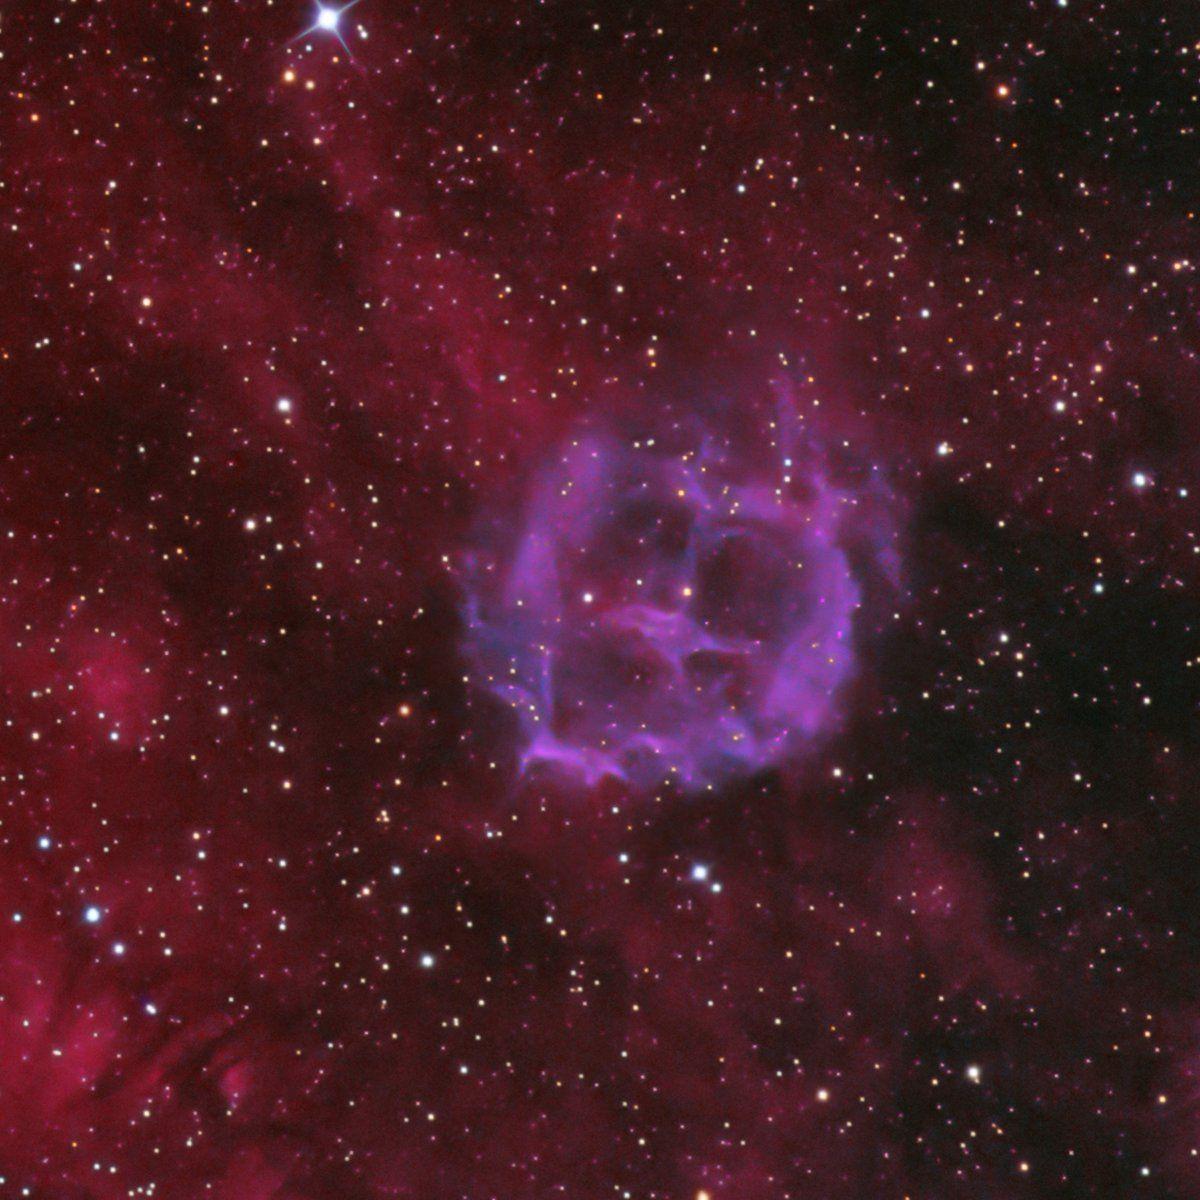 """#ASTRONOMÍA | La enana marrón con nubes de agua https://t.co/16ZEZll4pv"" #Ciencia #Inspirational"